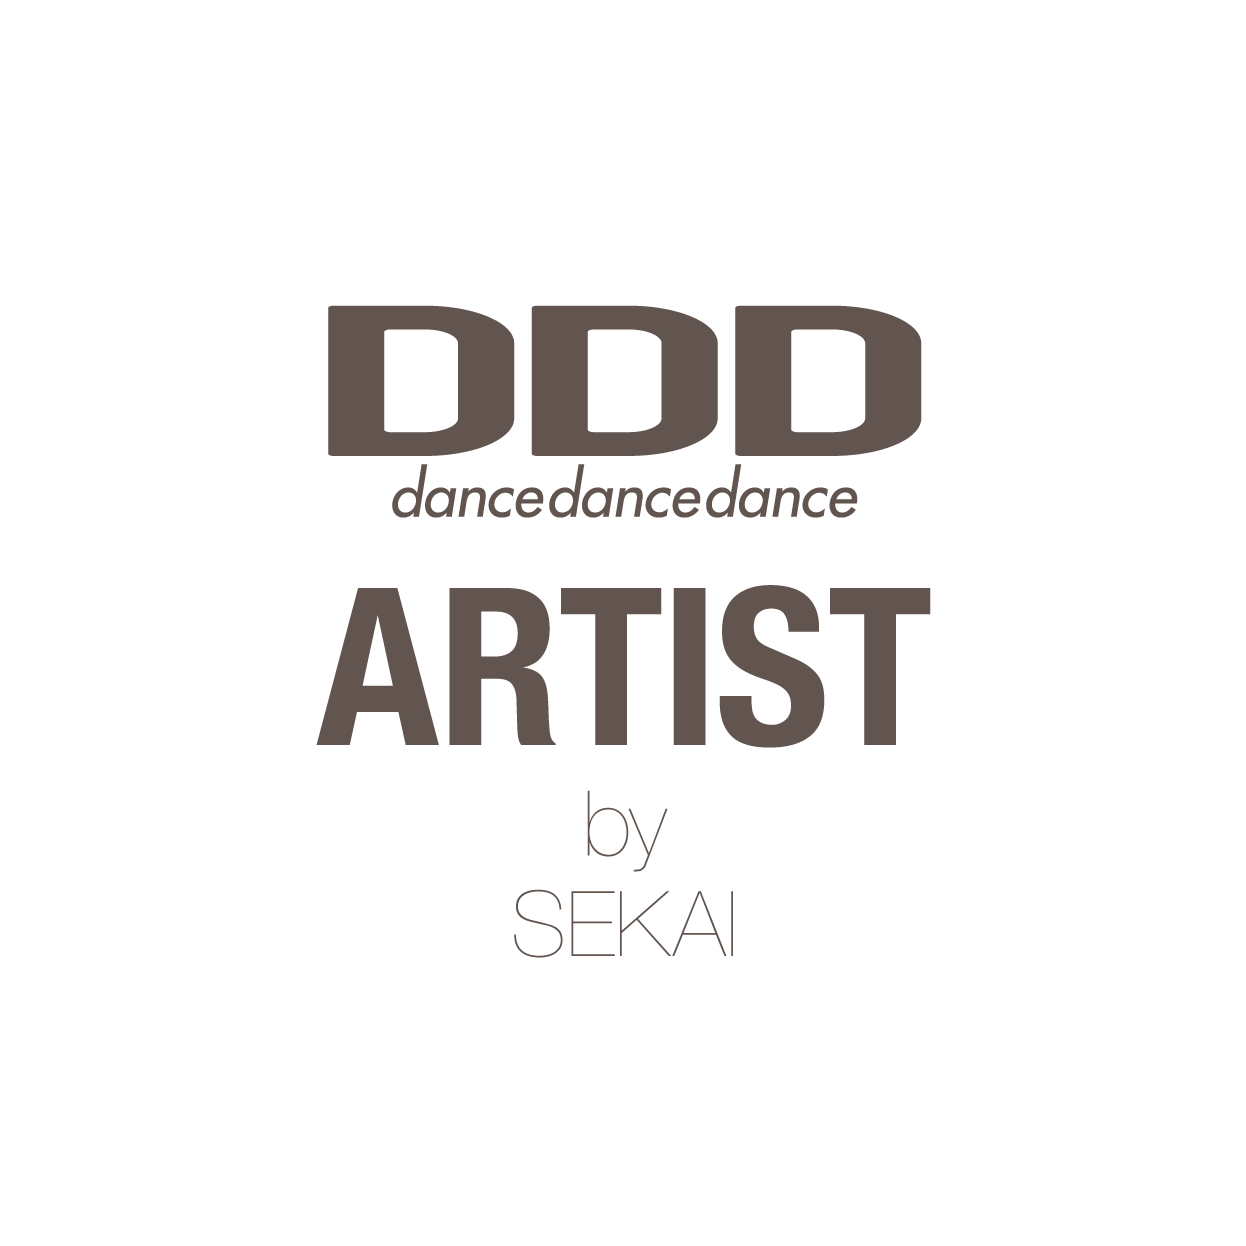 DDD ARTIST